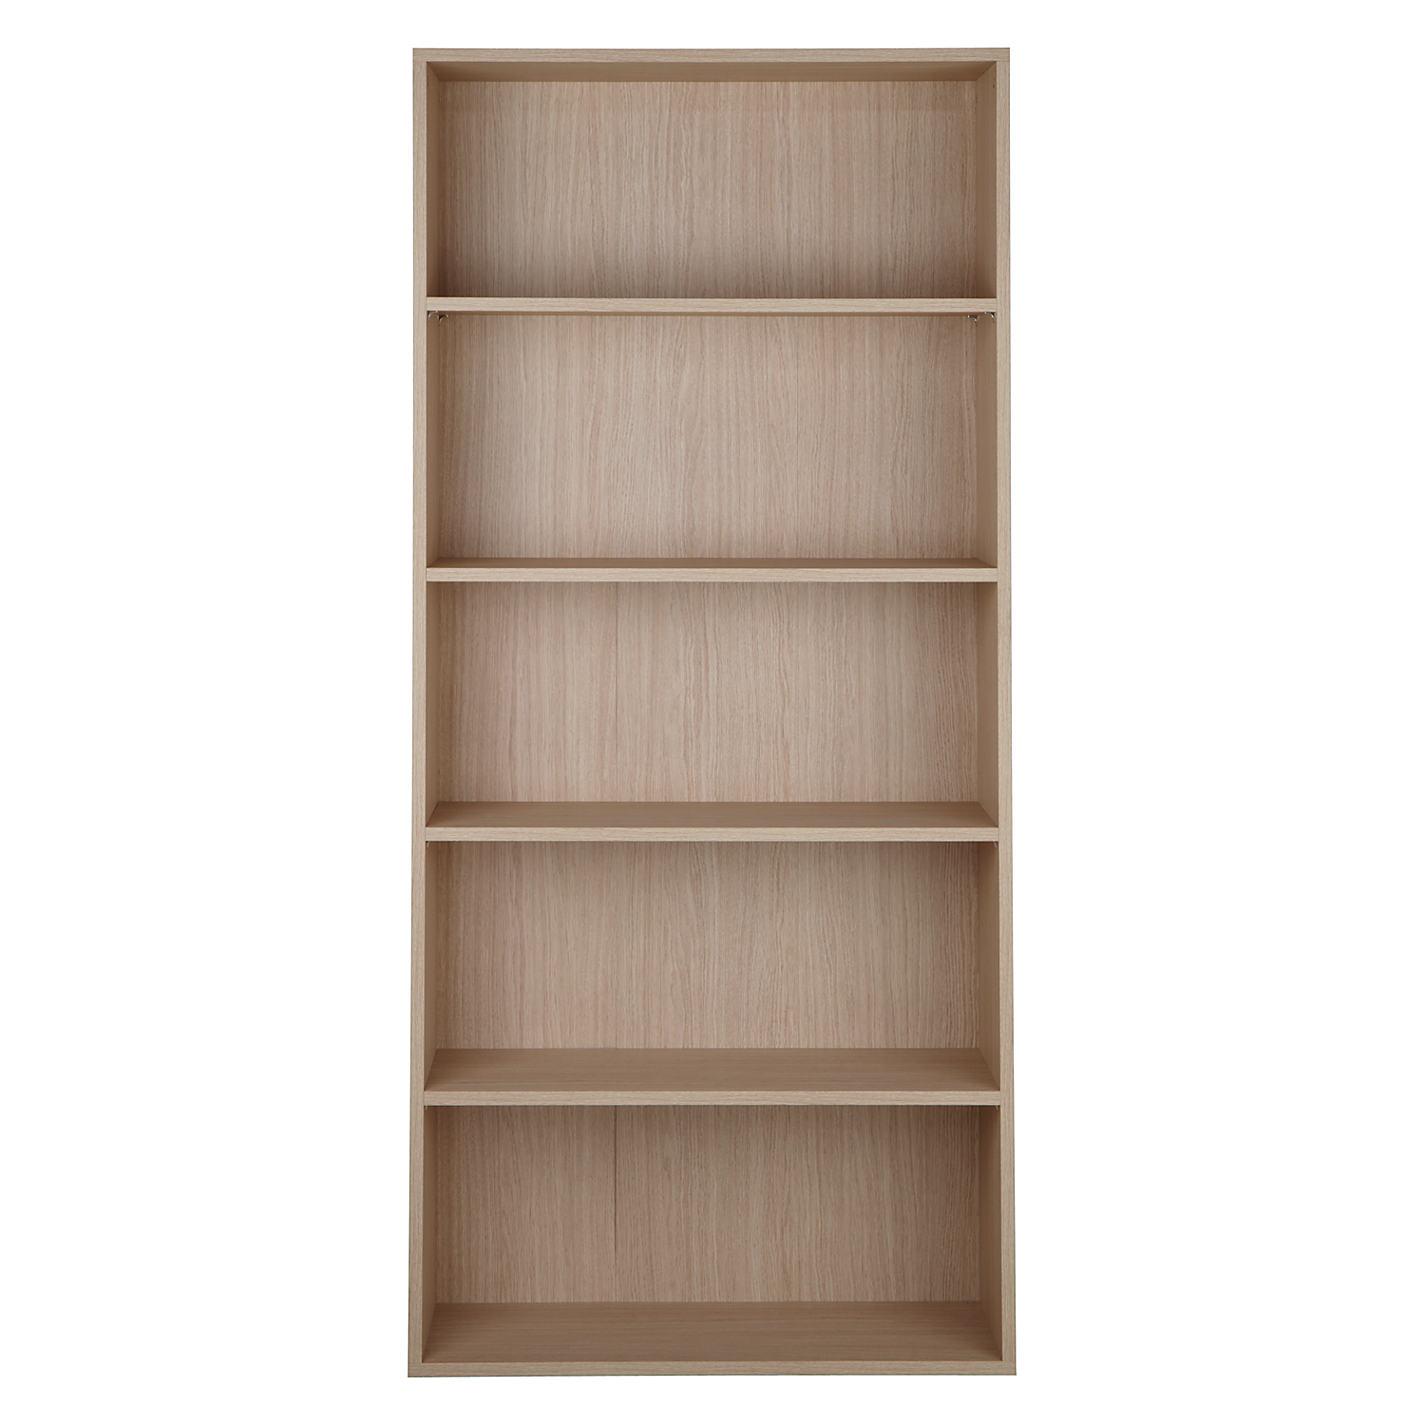 John Lewis The Basics Dexter Tall Wide Bookcase